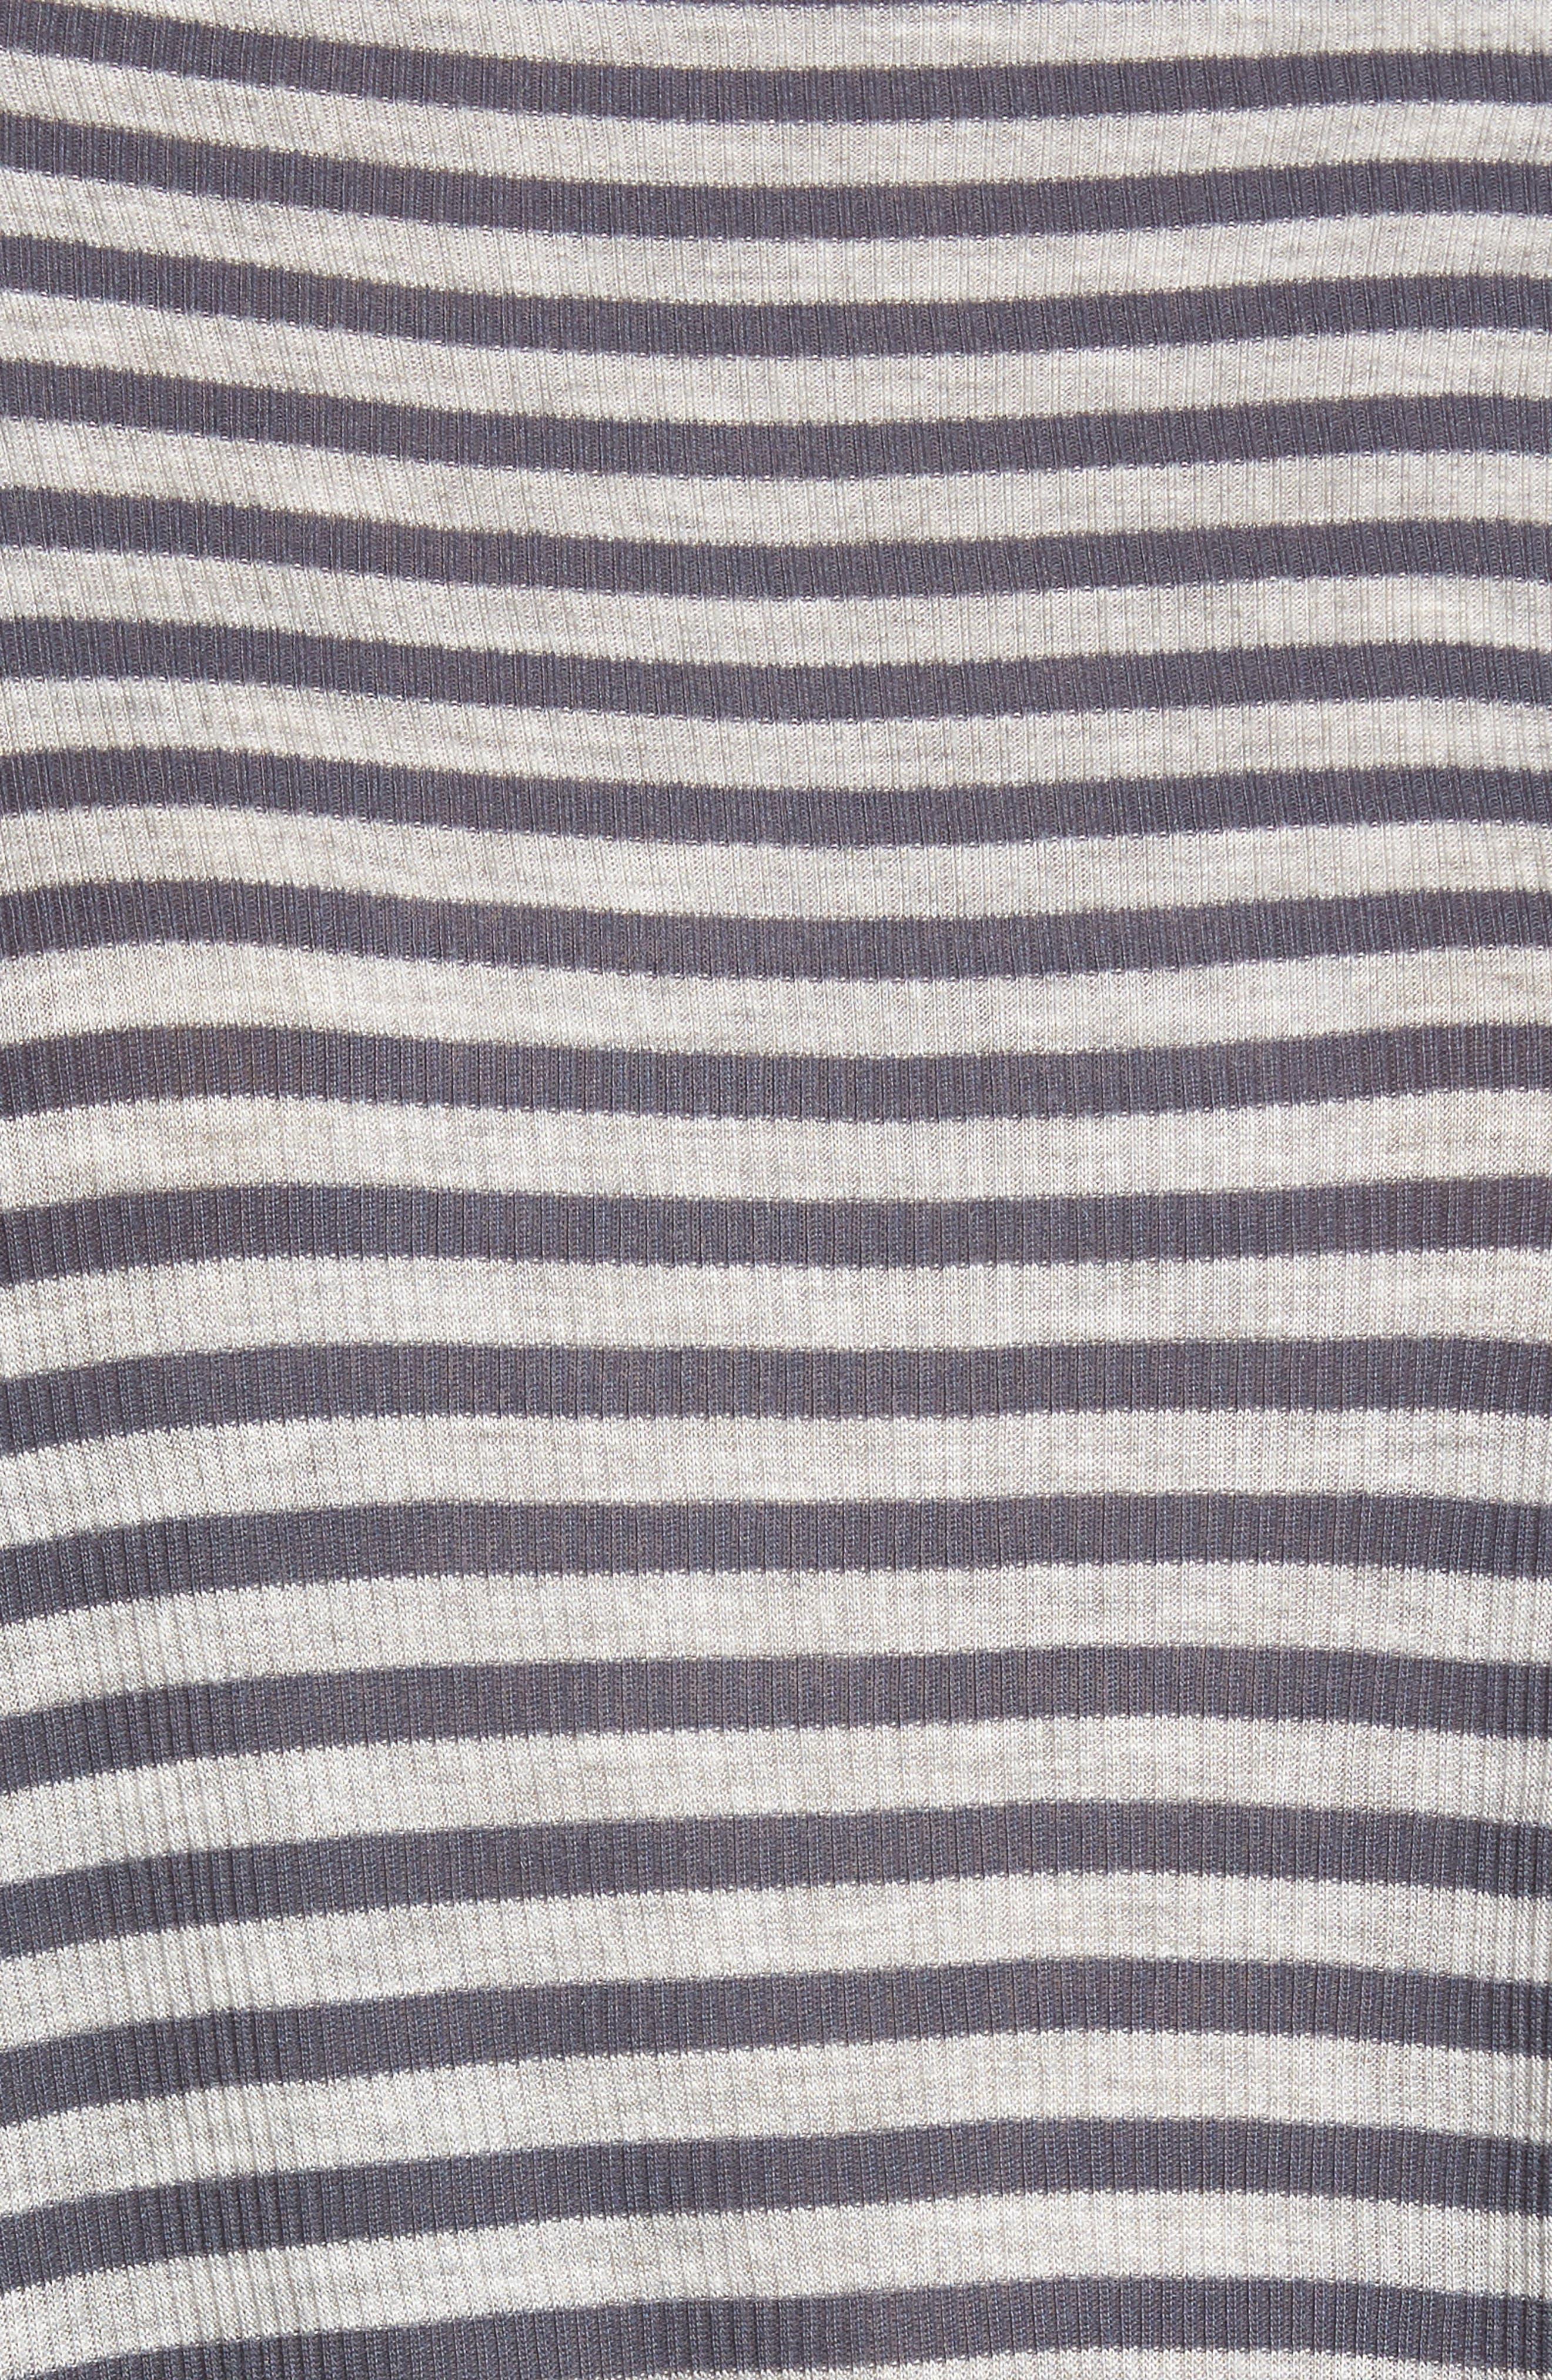 Anne Raglan Sleeve Tee,                             Alternate thumbnail 5, color,                             Blueberry/ Heather Grey